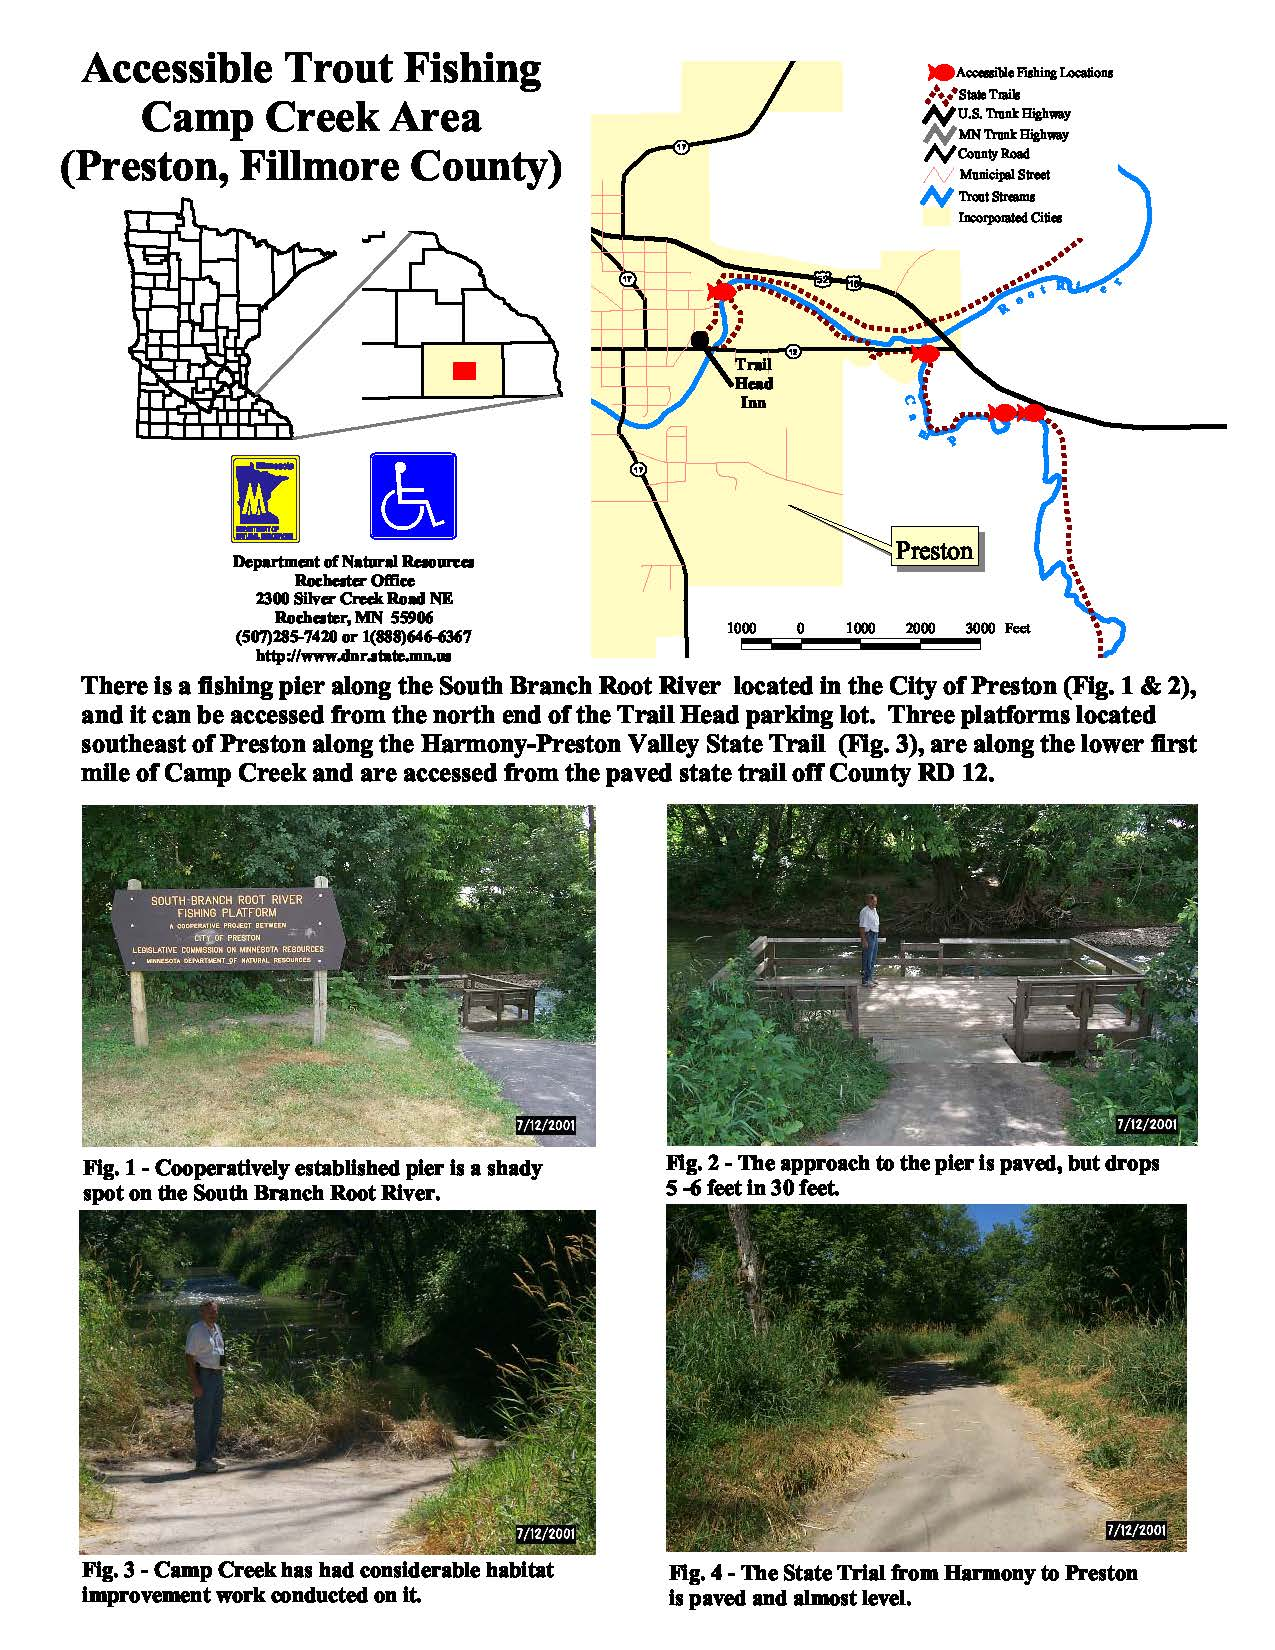 accessibletroutfishingmap_campcreek